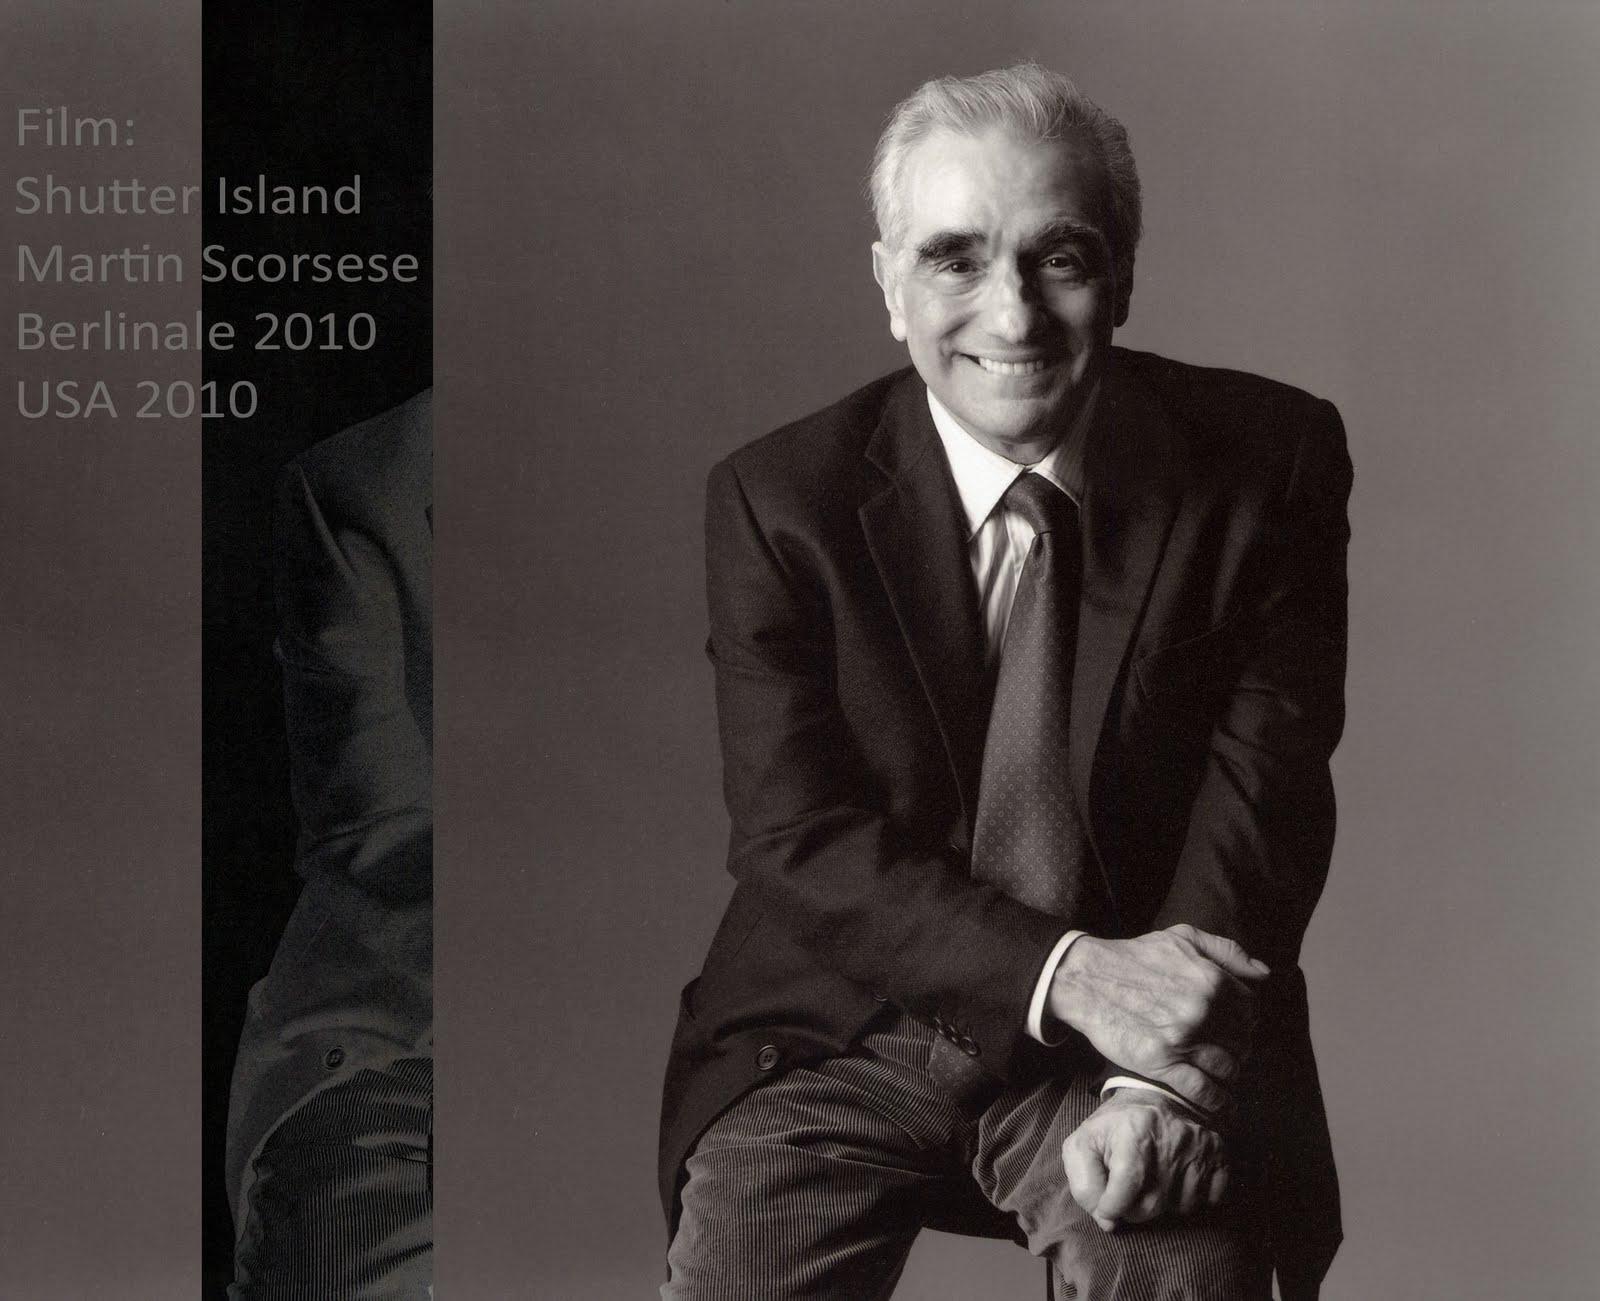 Martin Scorsese - Wallpaper Actress